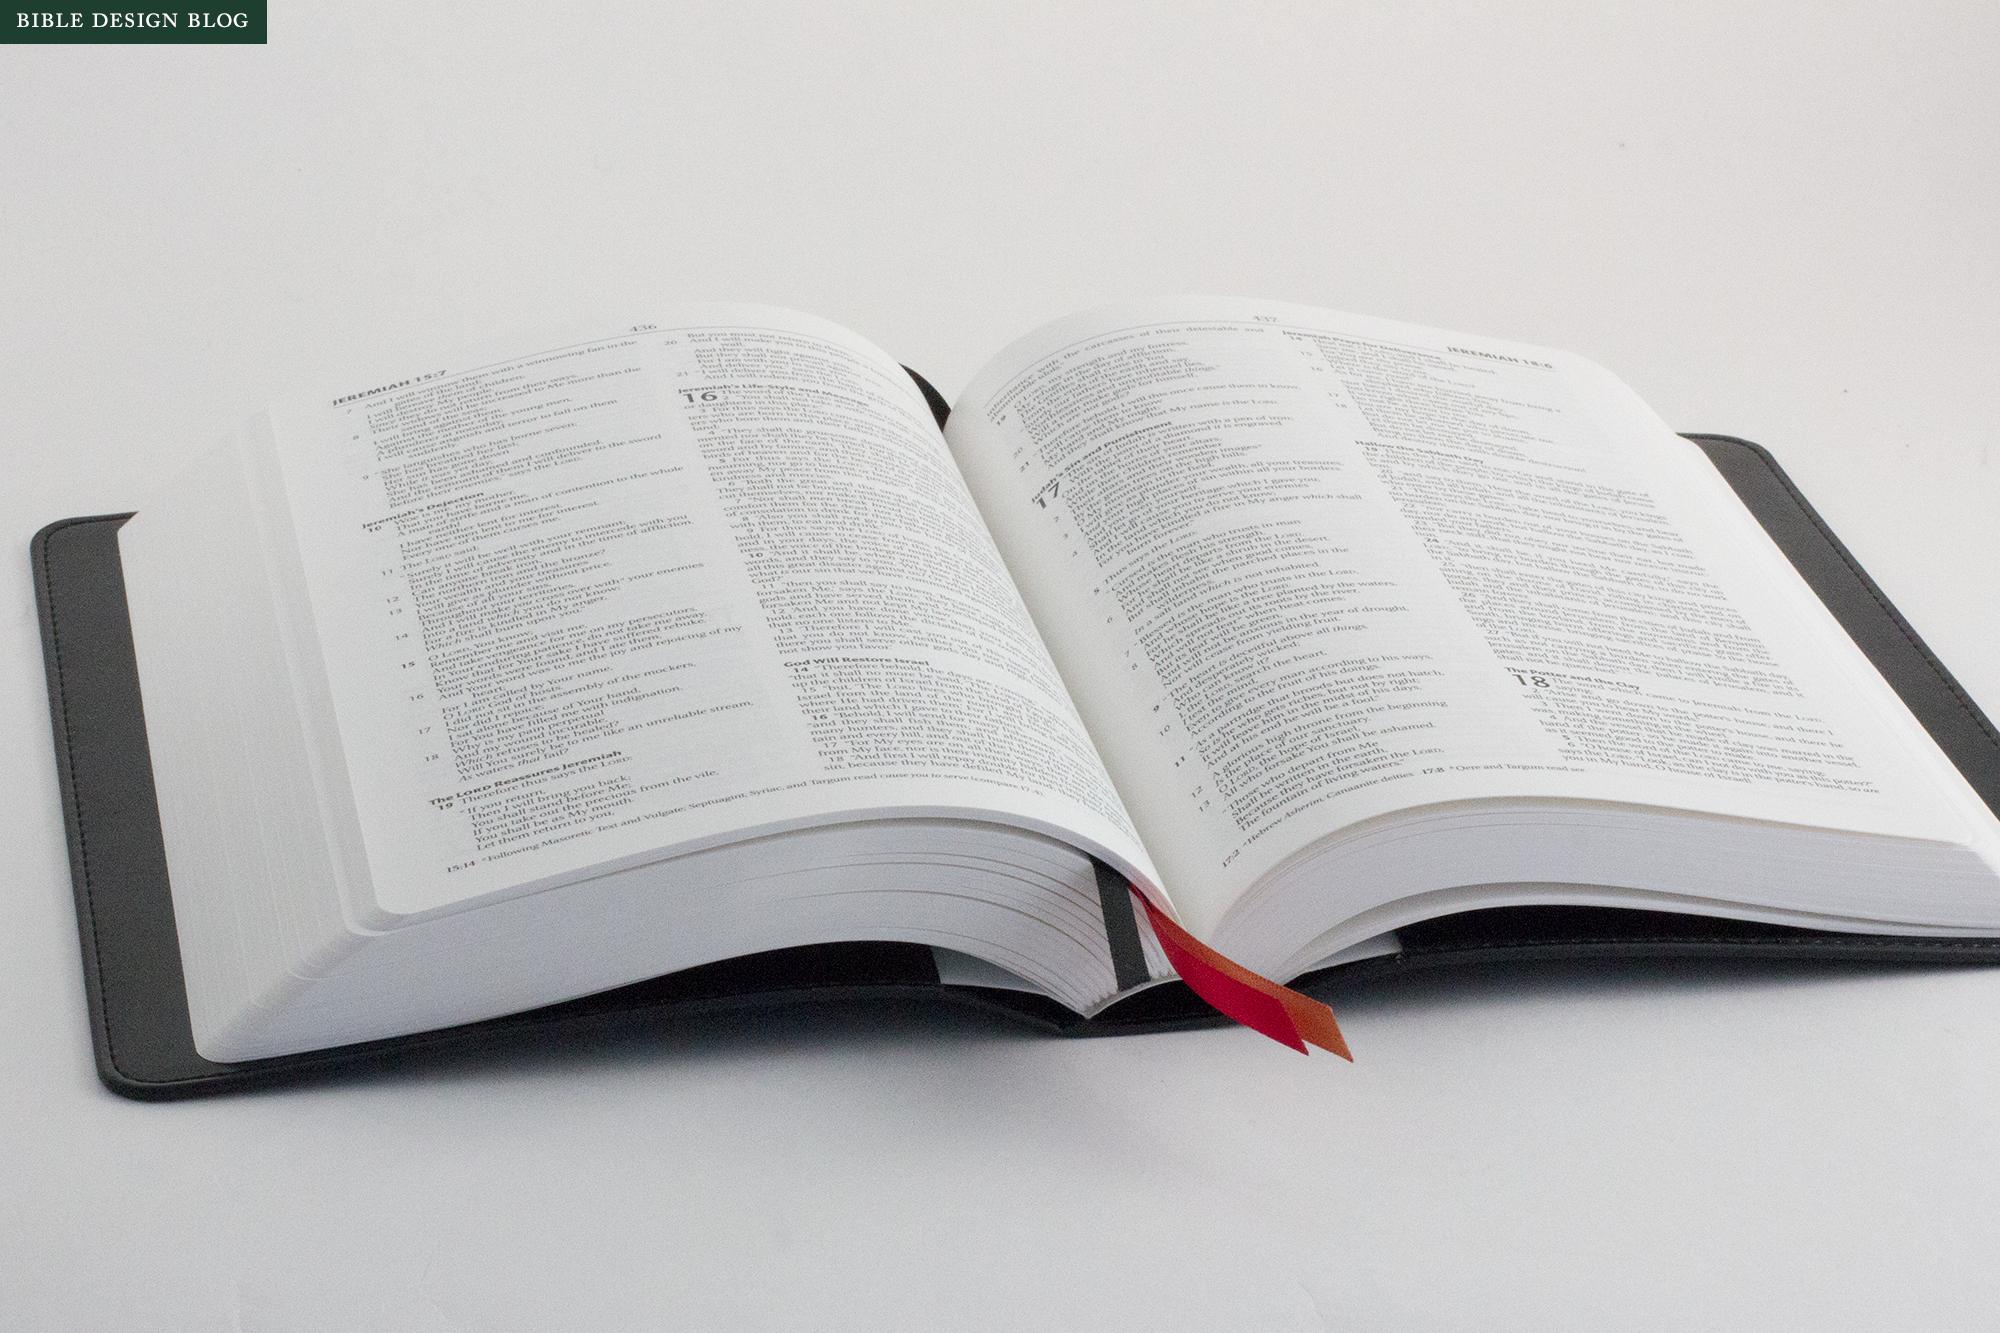 The Waterproof Bible — Bible Design Blog